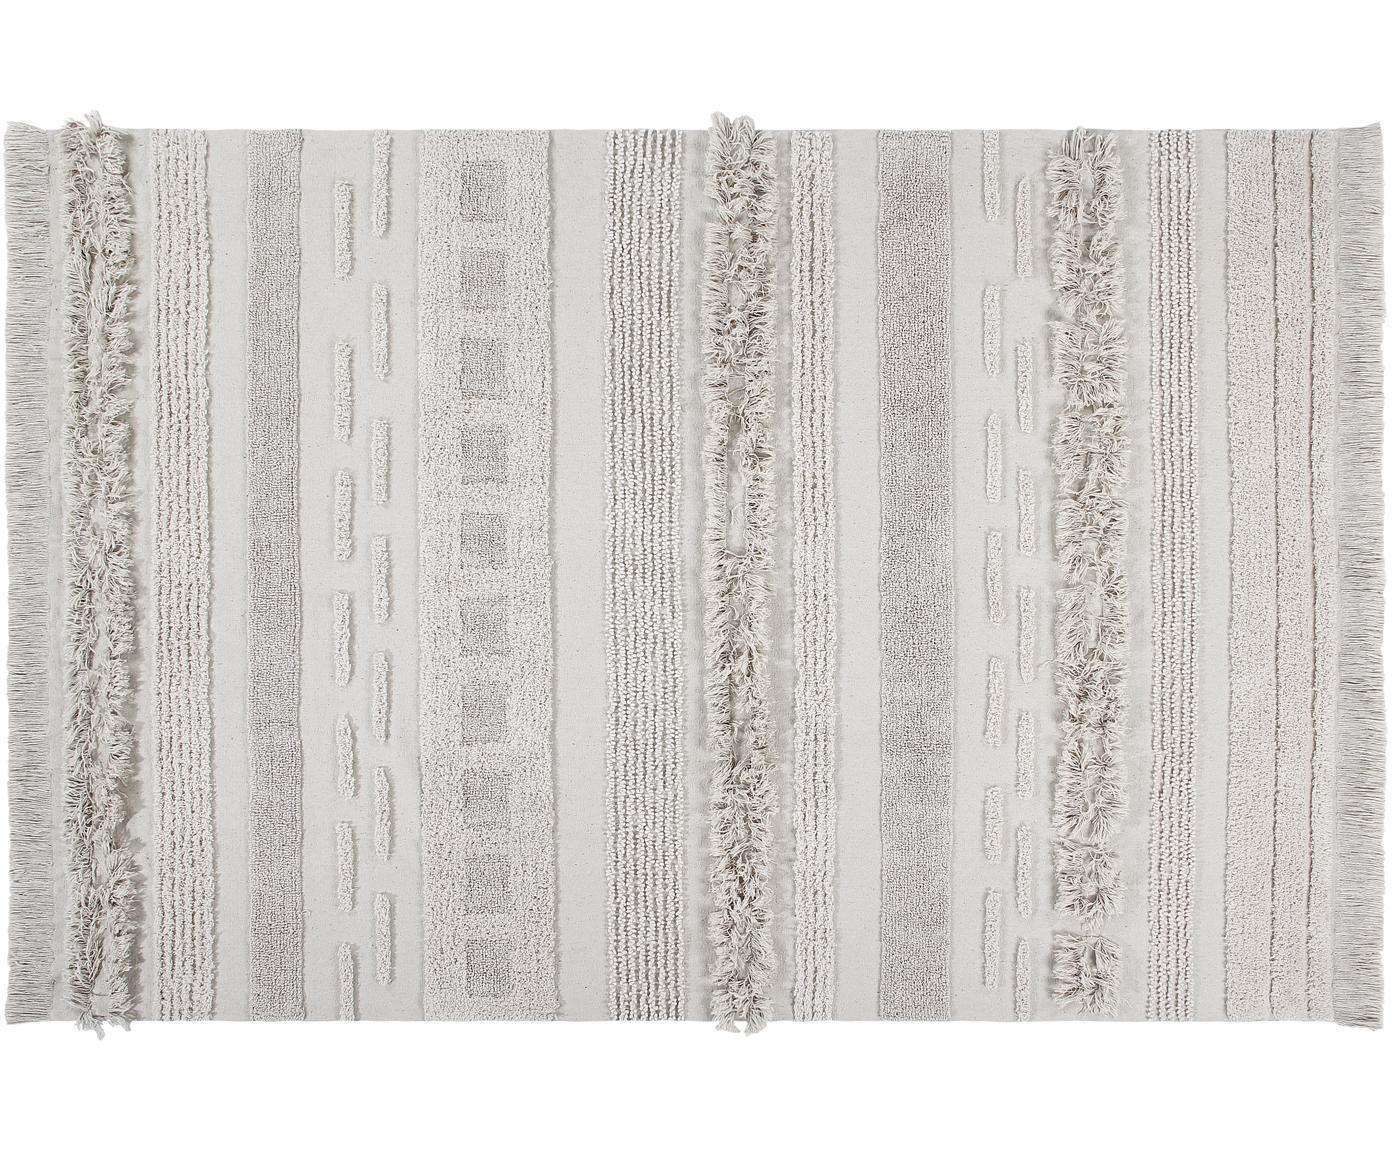 Alfombra texturizada Air, Parte superior: 97%algodón, 3%algodón r, Reverso: algodón reciclado, Beige, An 170 x L 240 cm (Tamaño M)